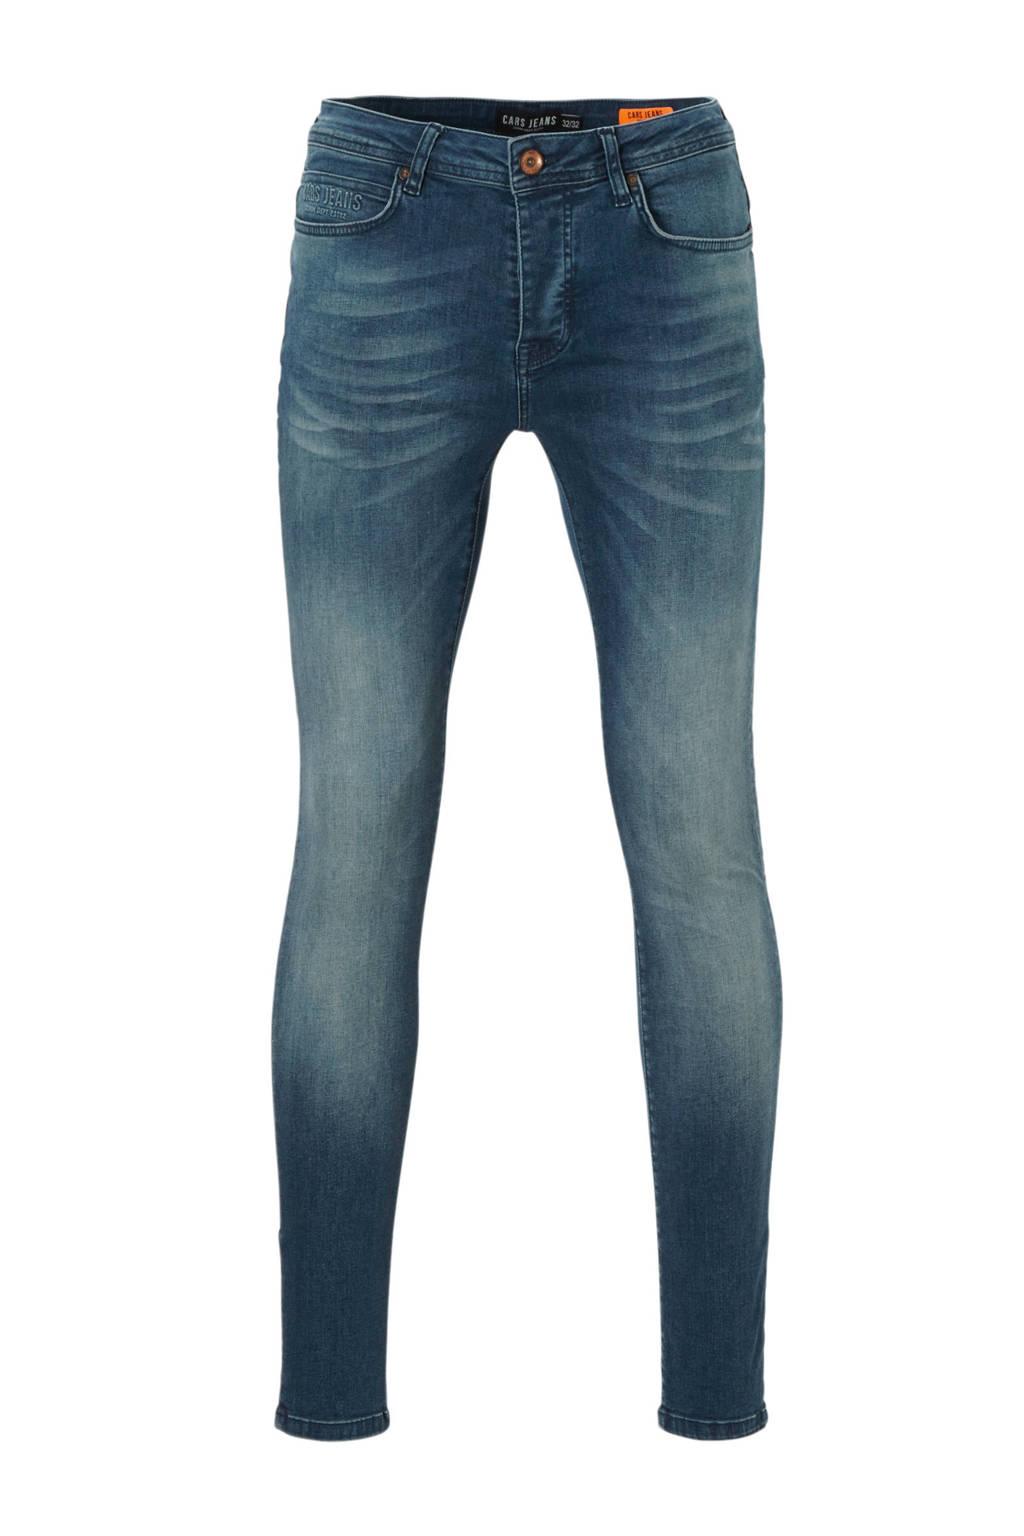 Cars  skinny skinny fit jeans Dust, Dark denim